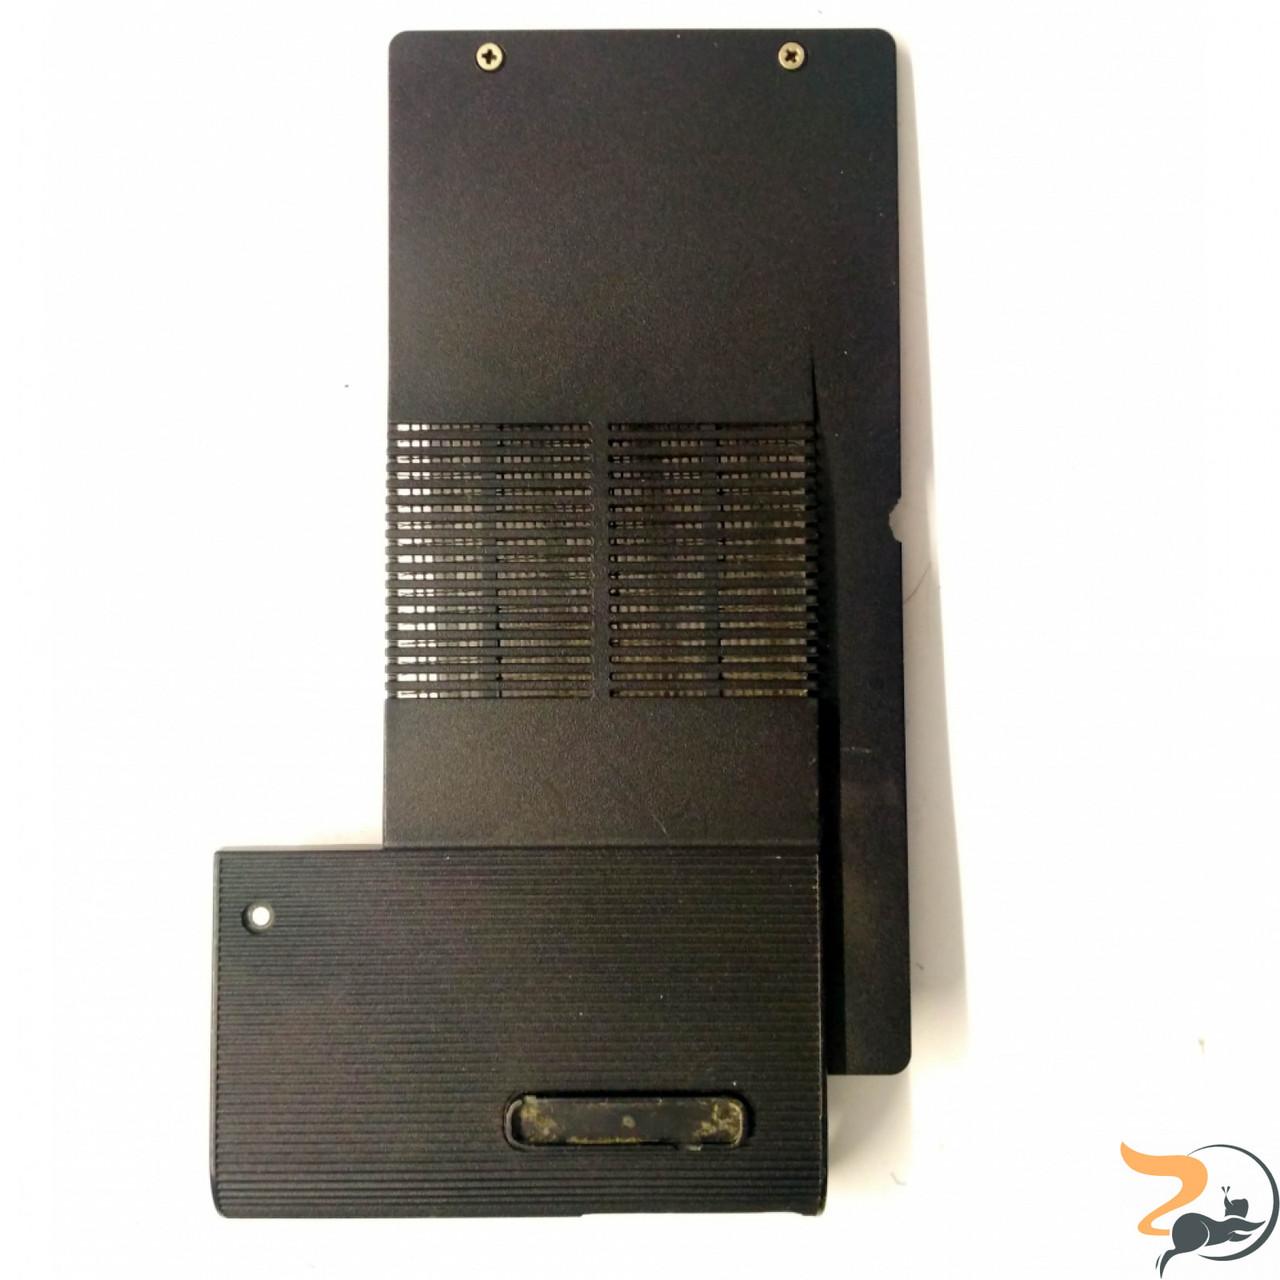 Сервісна кришка для ноутбука Acer Extensa 4100, 3BZL2HCTN11, Б/В. Без пошкоджень.Має подряпини.